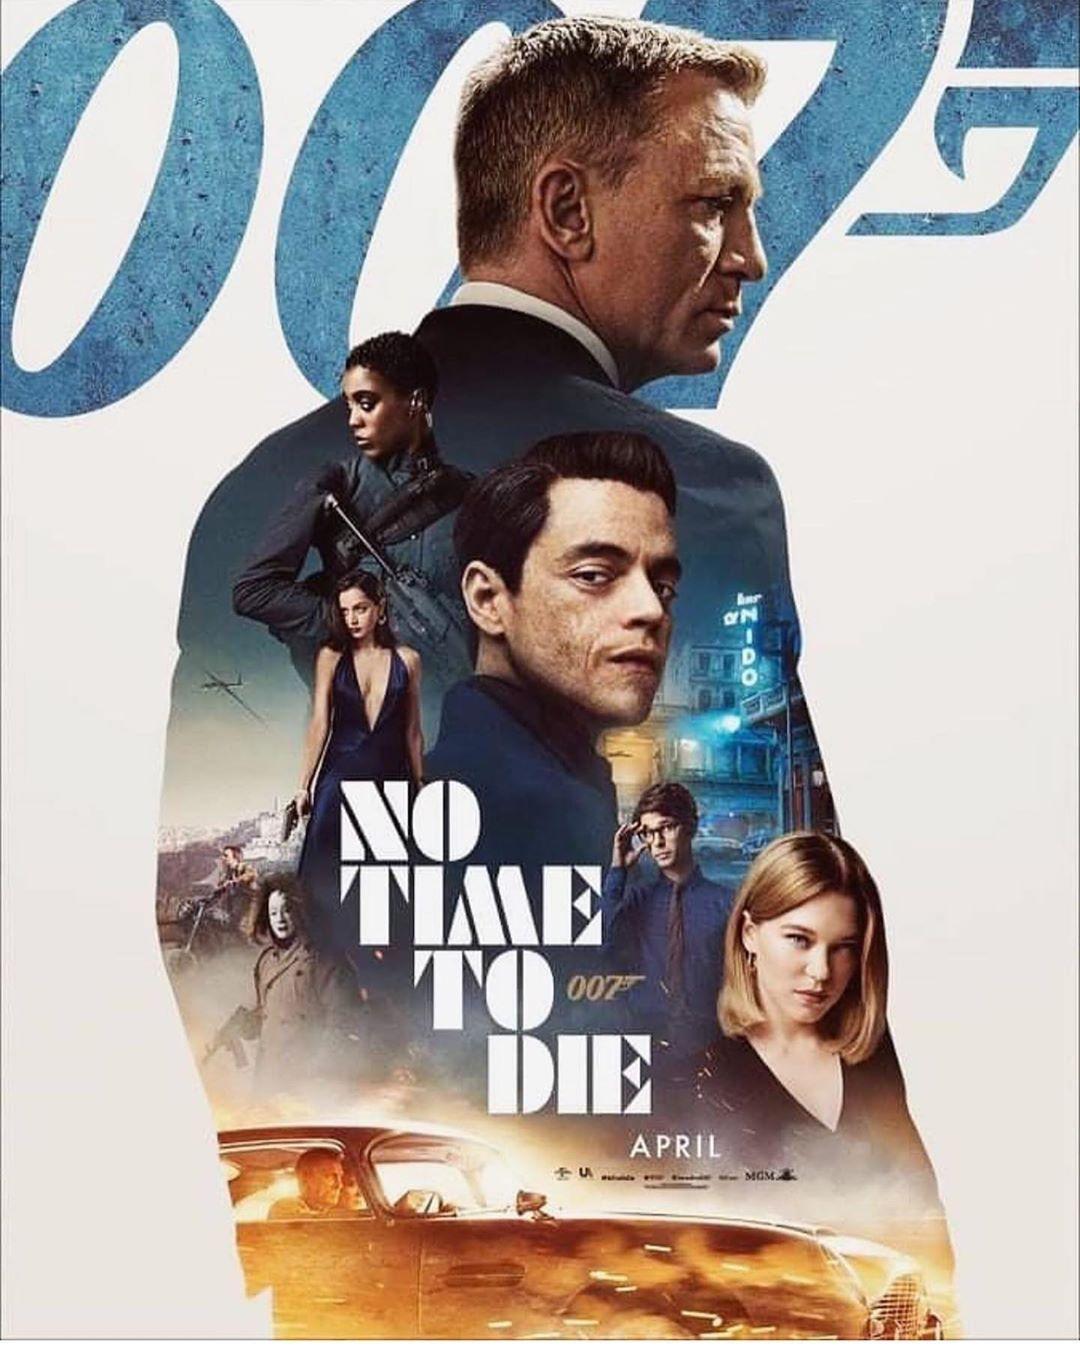 Pin By Judy Pakes On Dc Movies Series Free Movies Online New Upcoming Movies Full Movies Online Free